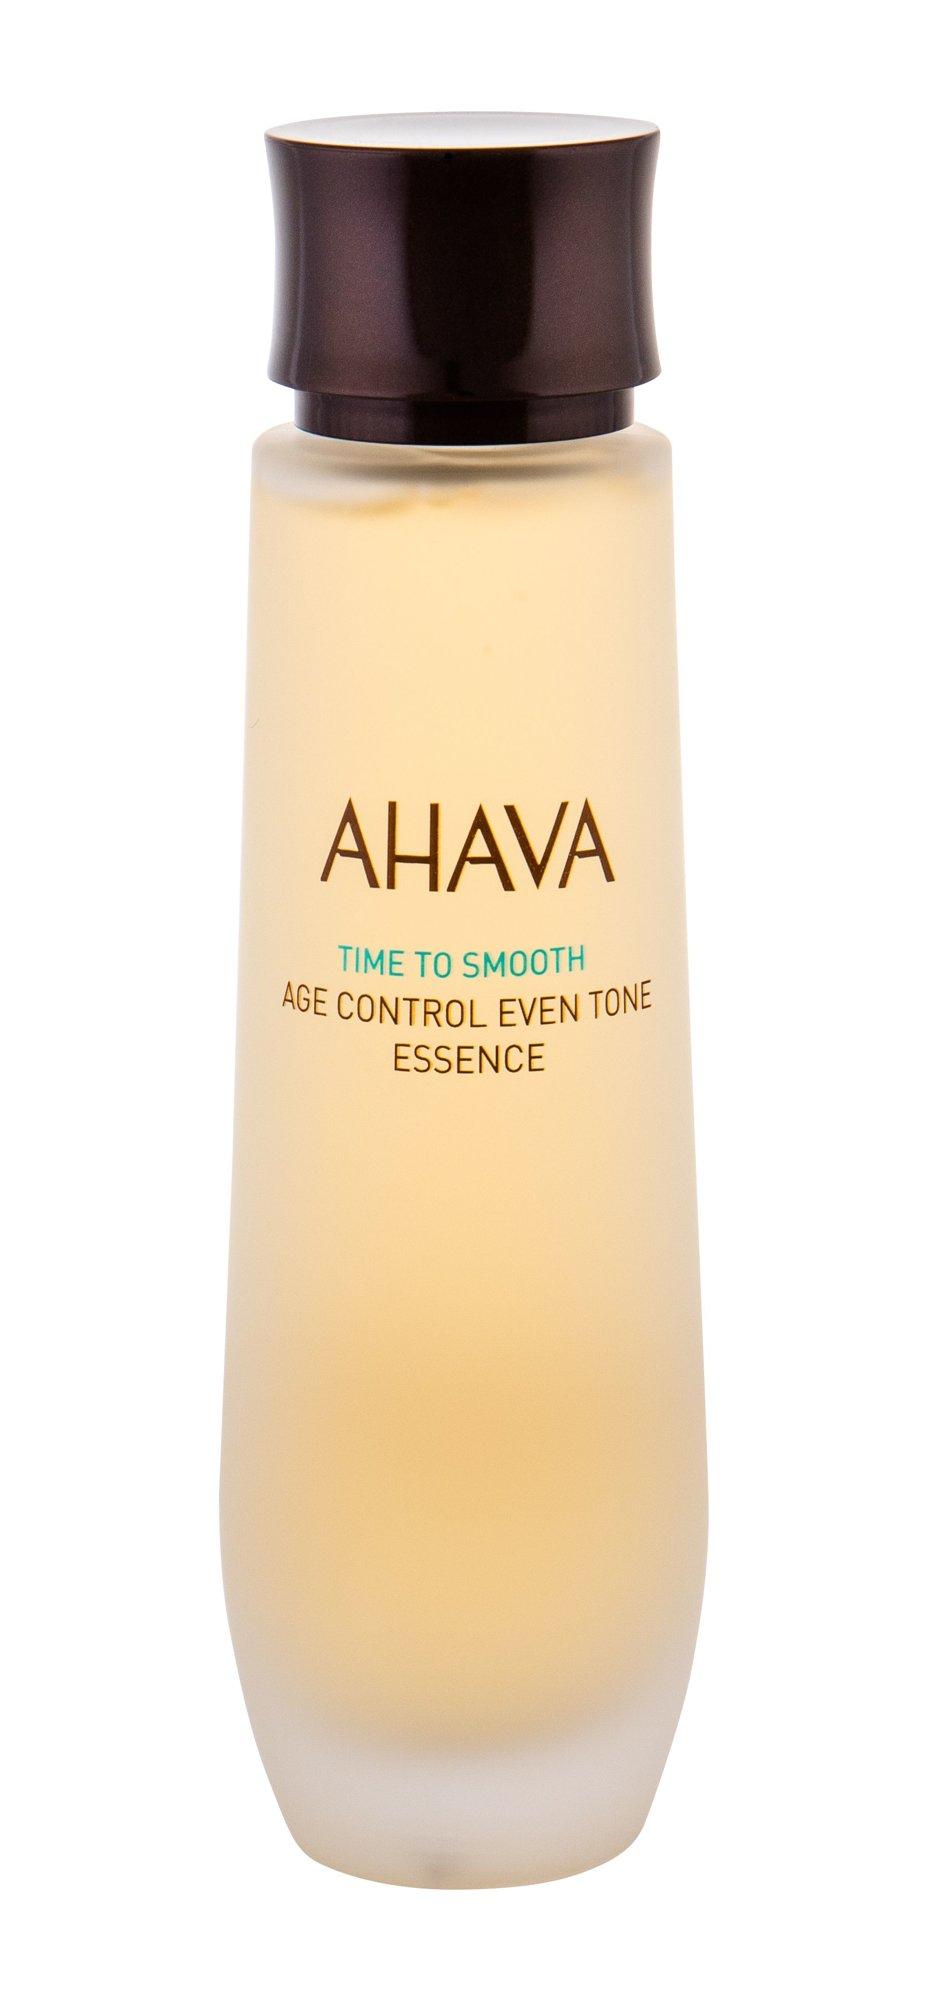 AHAVA Age Control Skin Serum 100ml  Time To Smooth